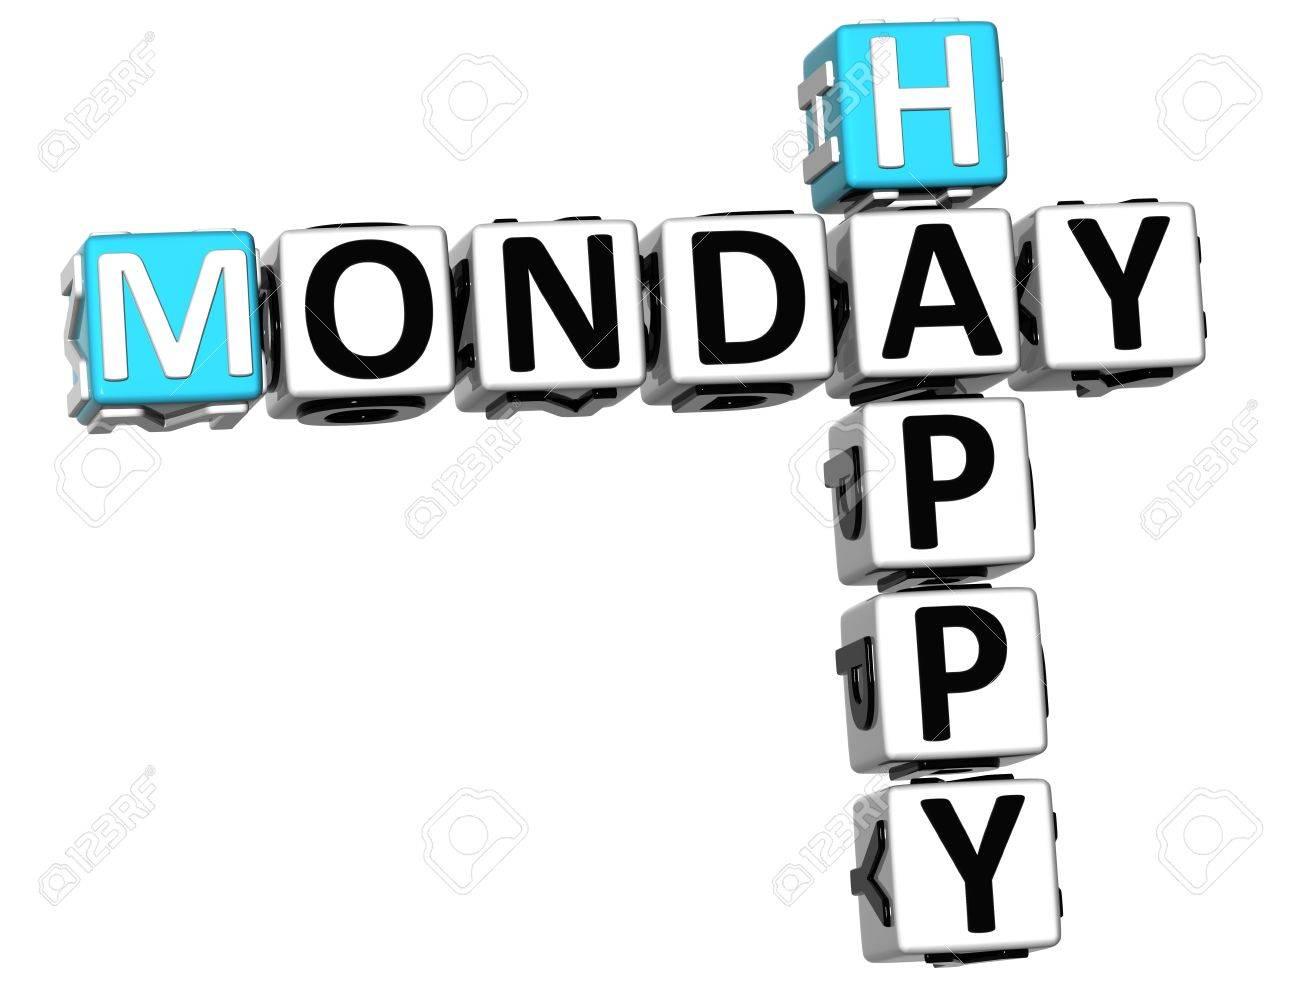 3D Happy Monday Crossword On White Background Stock Photo